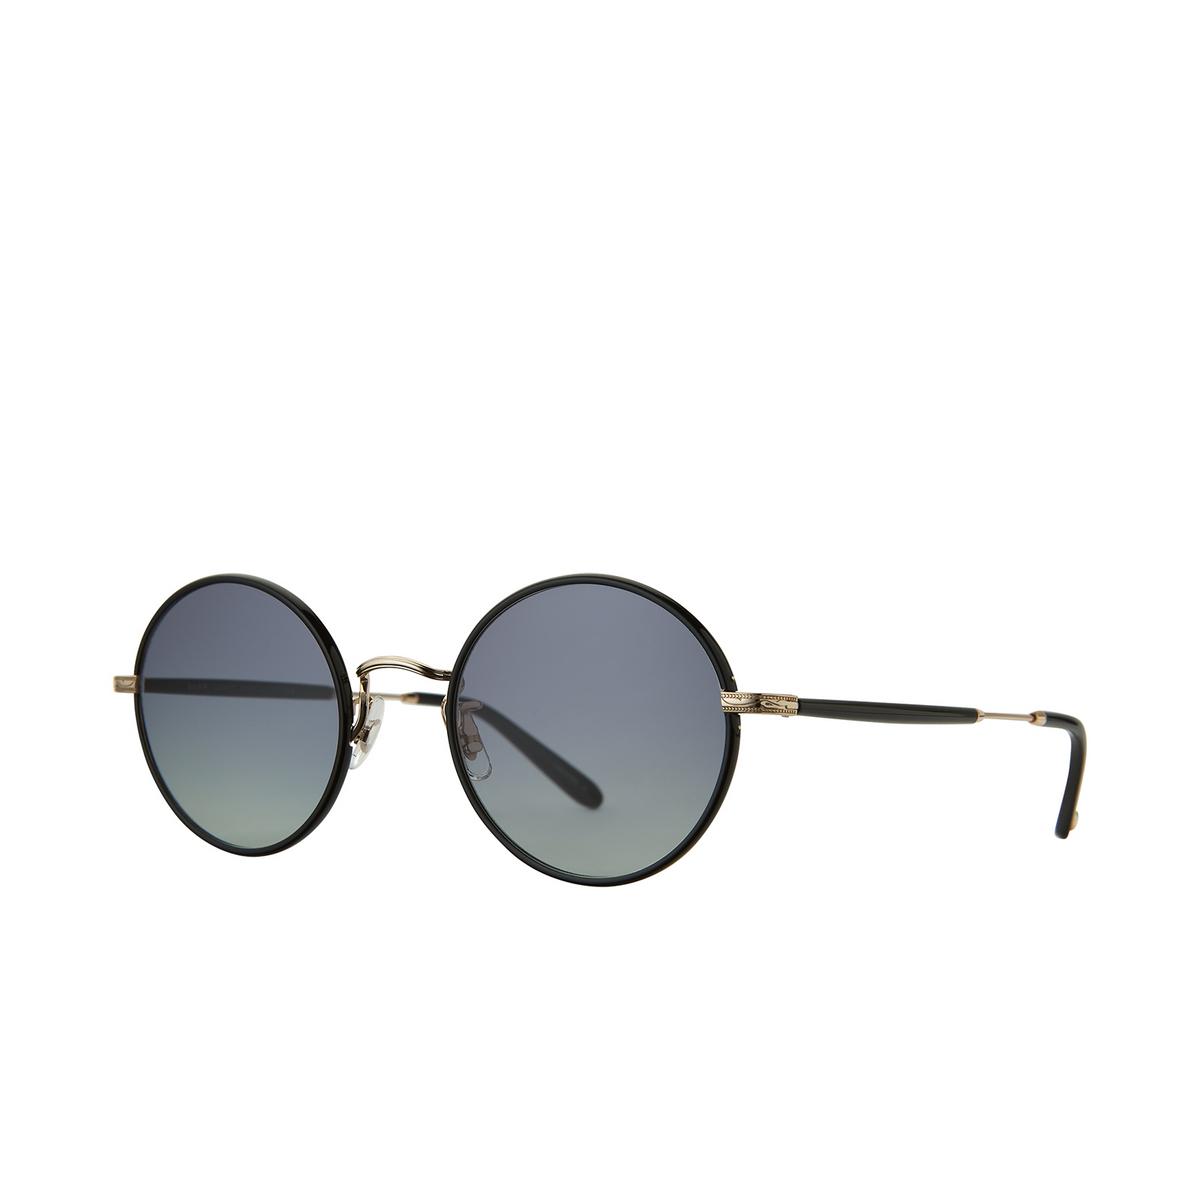 Garrett Leight® Round Sunglasses: Fonda Sun color Black - Gold Bk-g-bk/swpg - three-quarters view.